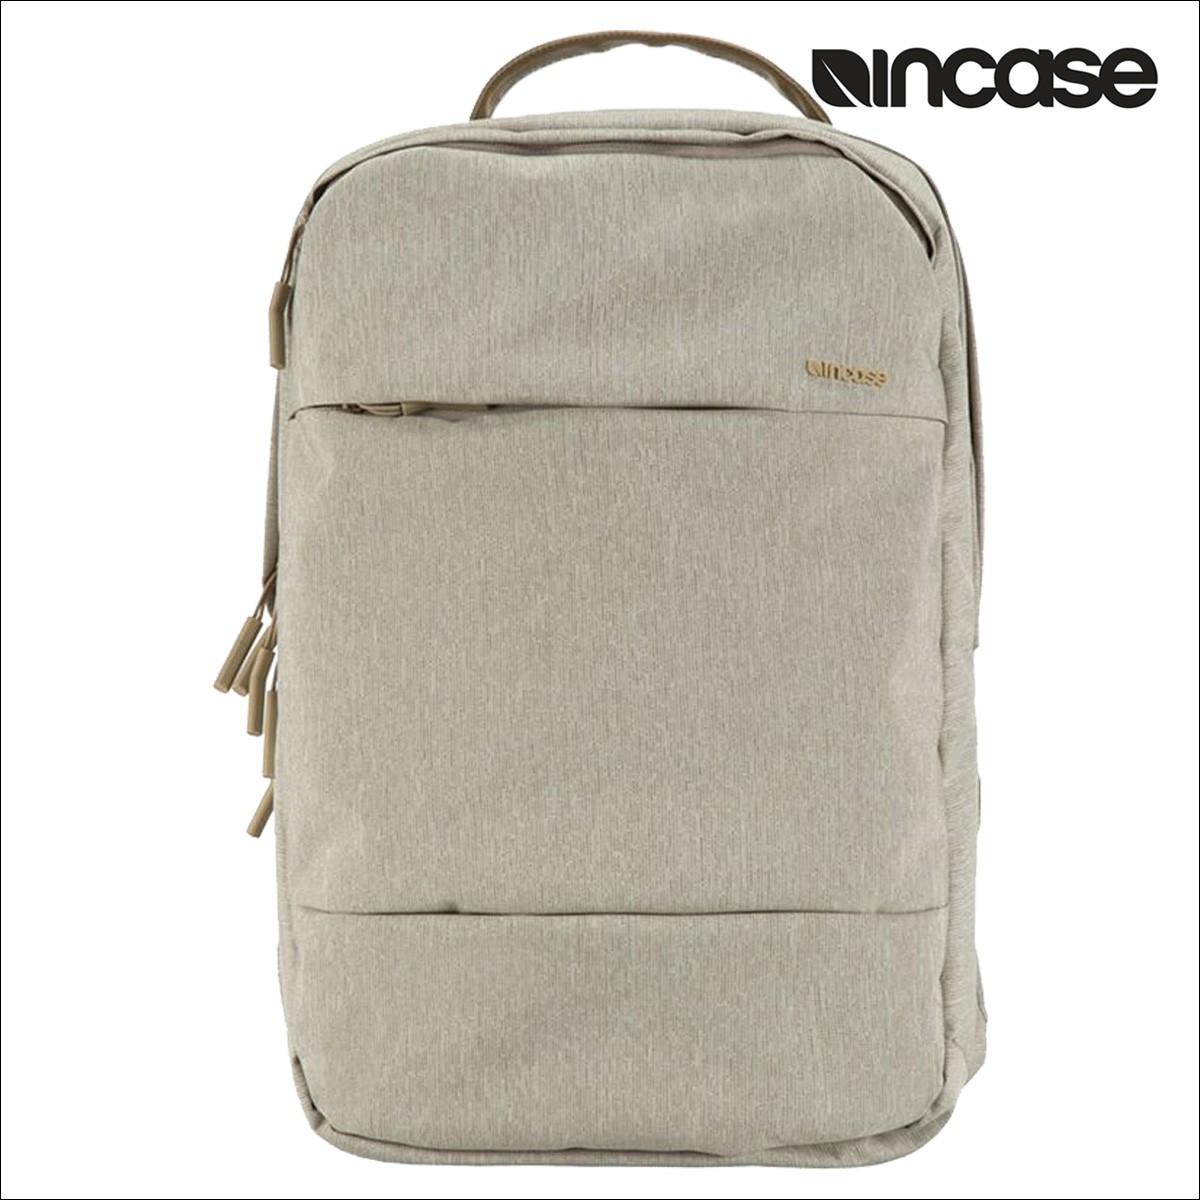 INCASE インケース バックパック リュック 19L CITY BACKPACK INCO100207 レディース メンズ ヘザーカーキ